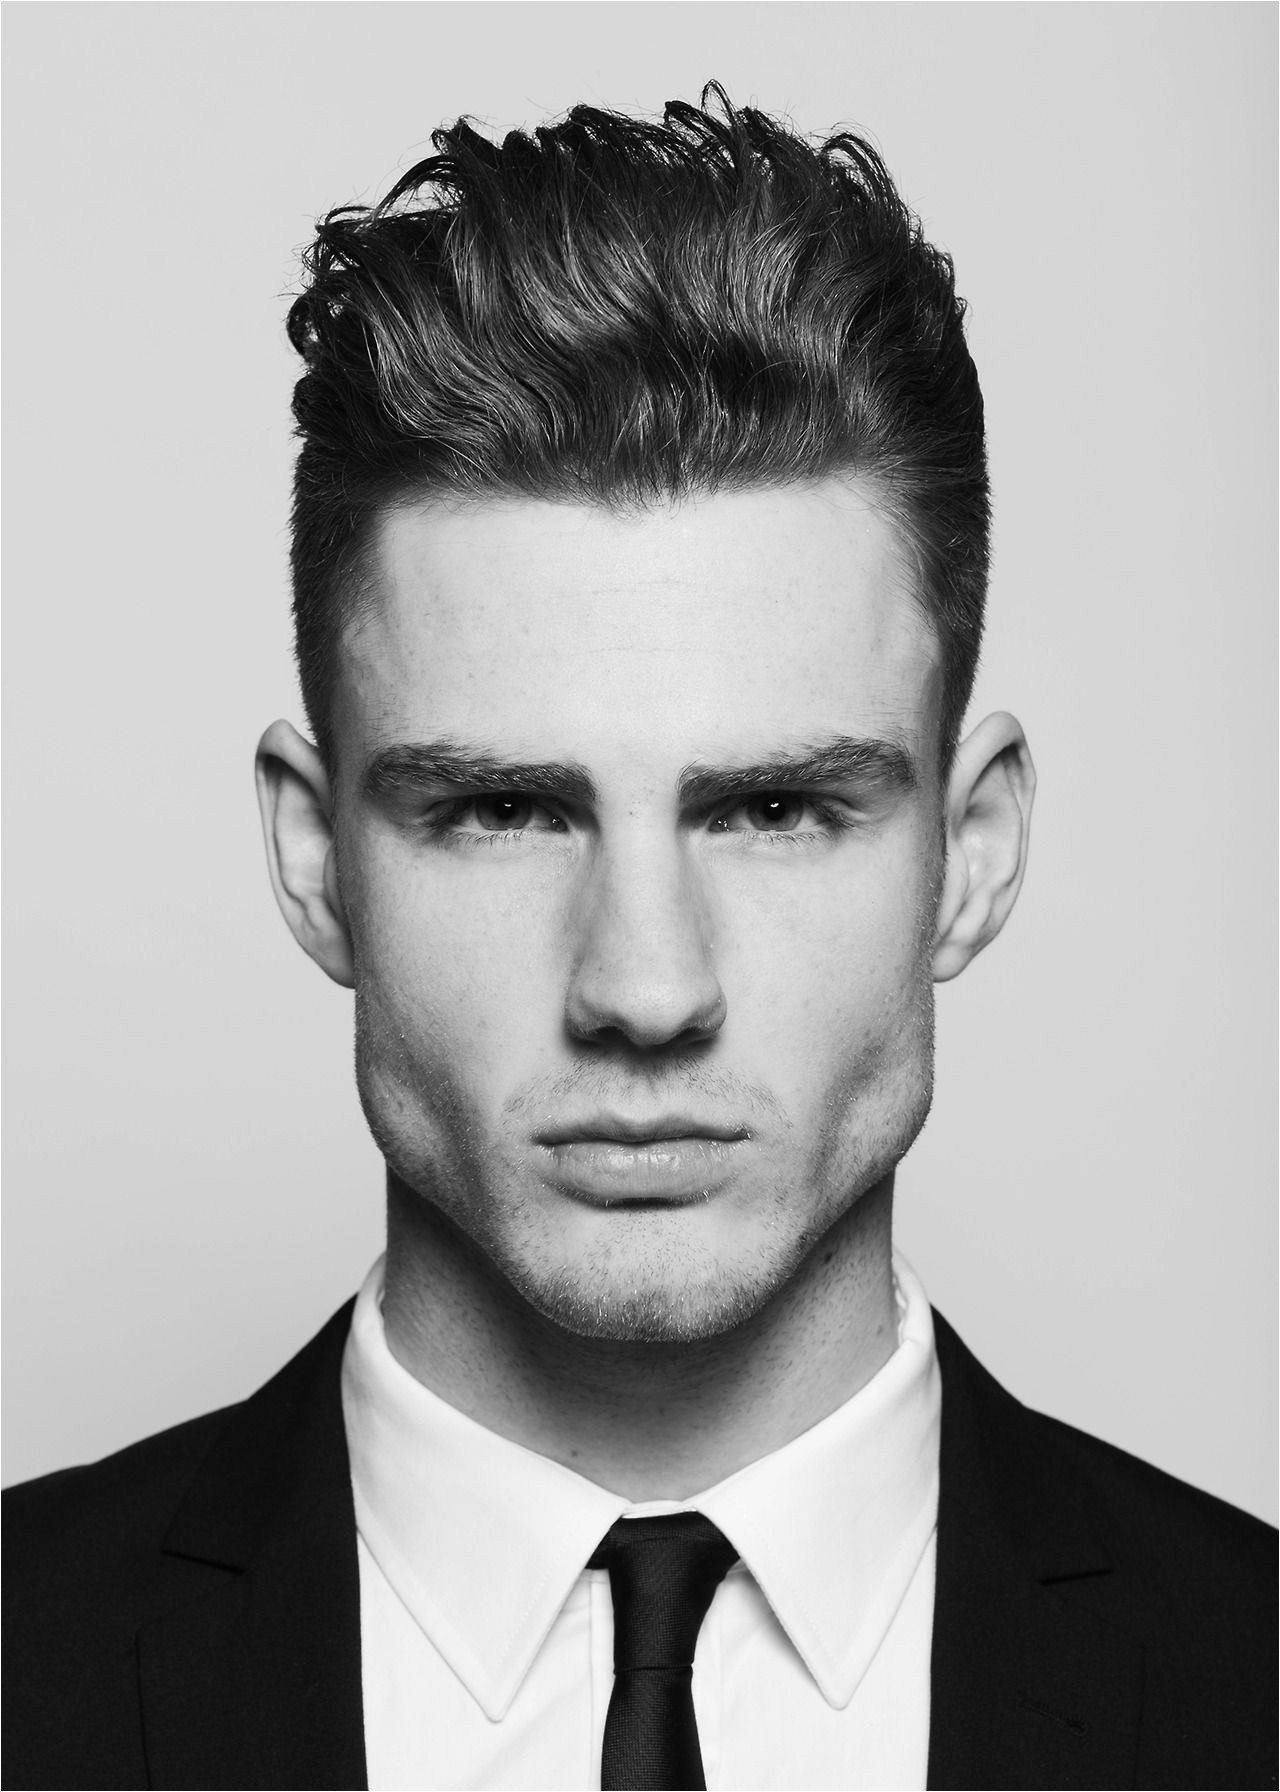 1920 Girl Hairstyles New 1920s Hairstyles Luxury Male Hair Styles Best Hairstyles Men 0d